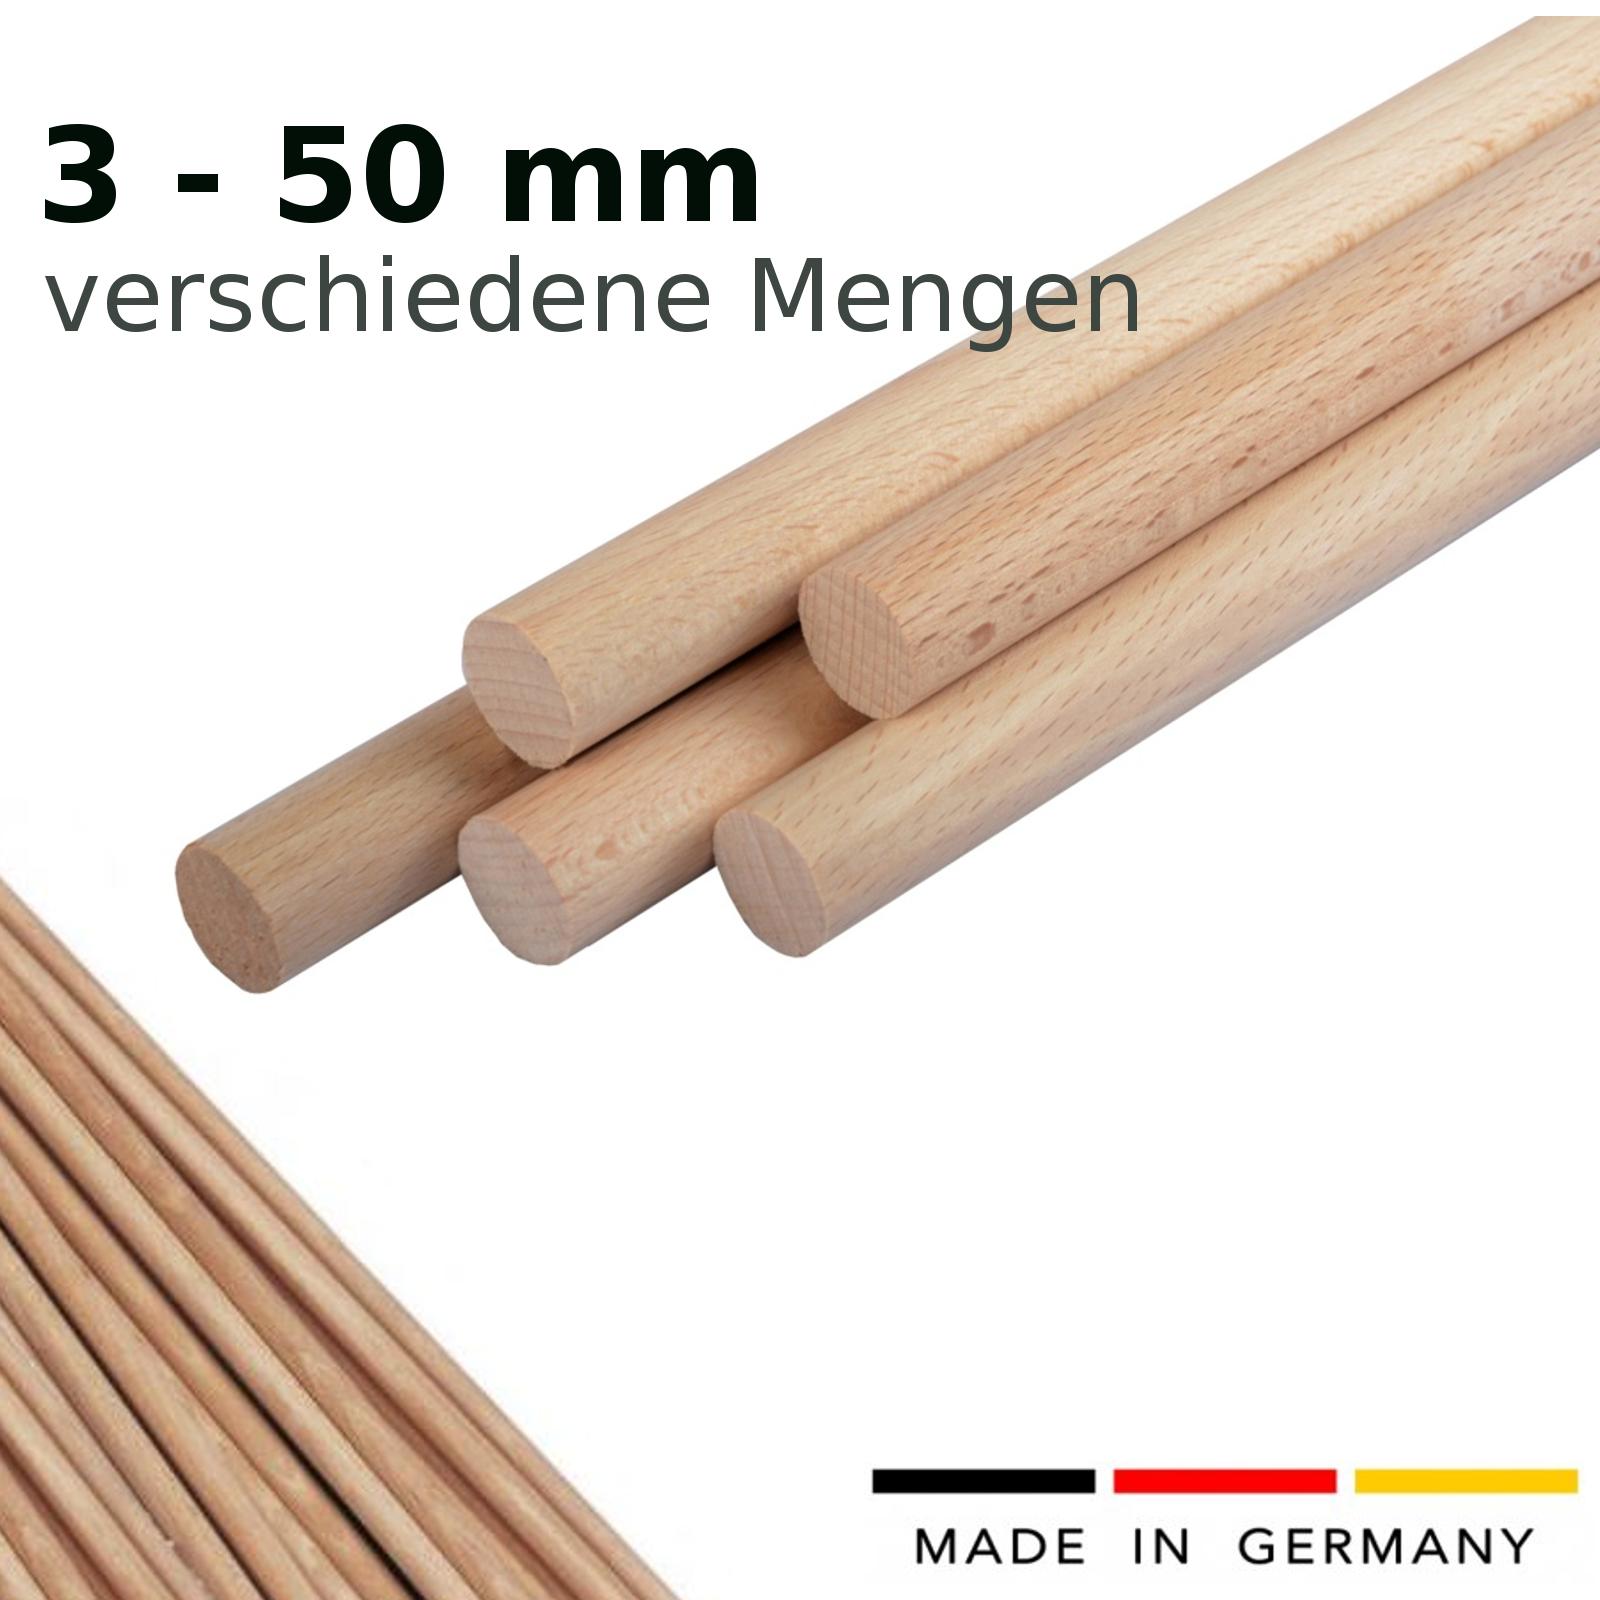 100 er Set - 100 Stück -Rundstäbe - Länge 33 cm - Rundstab Buche glatt - Buchestab (100 Stck)